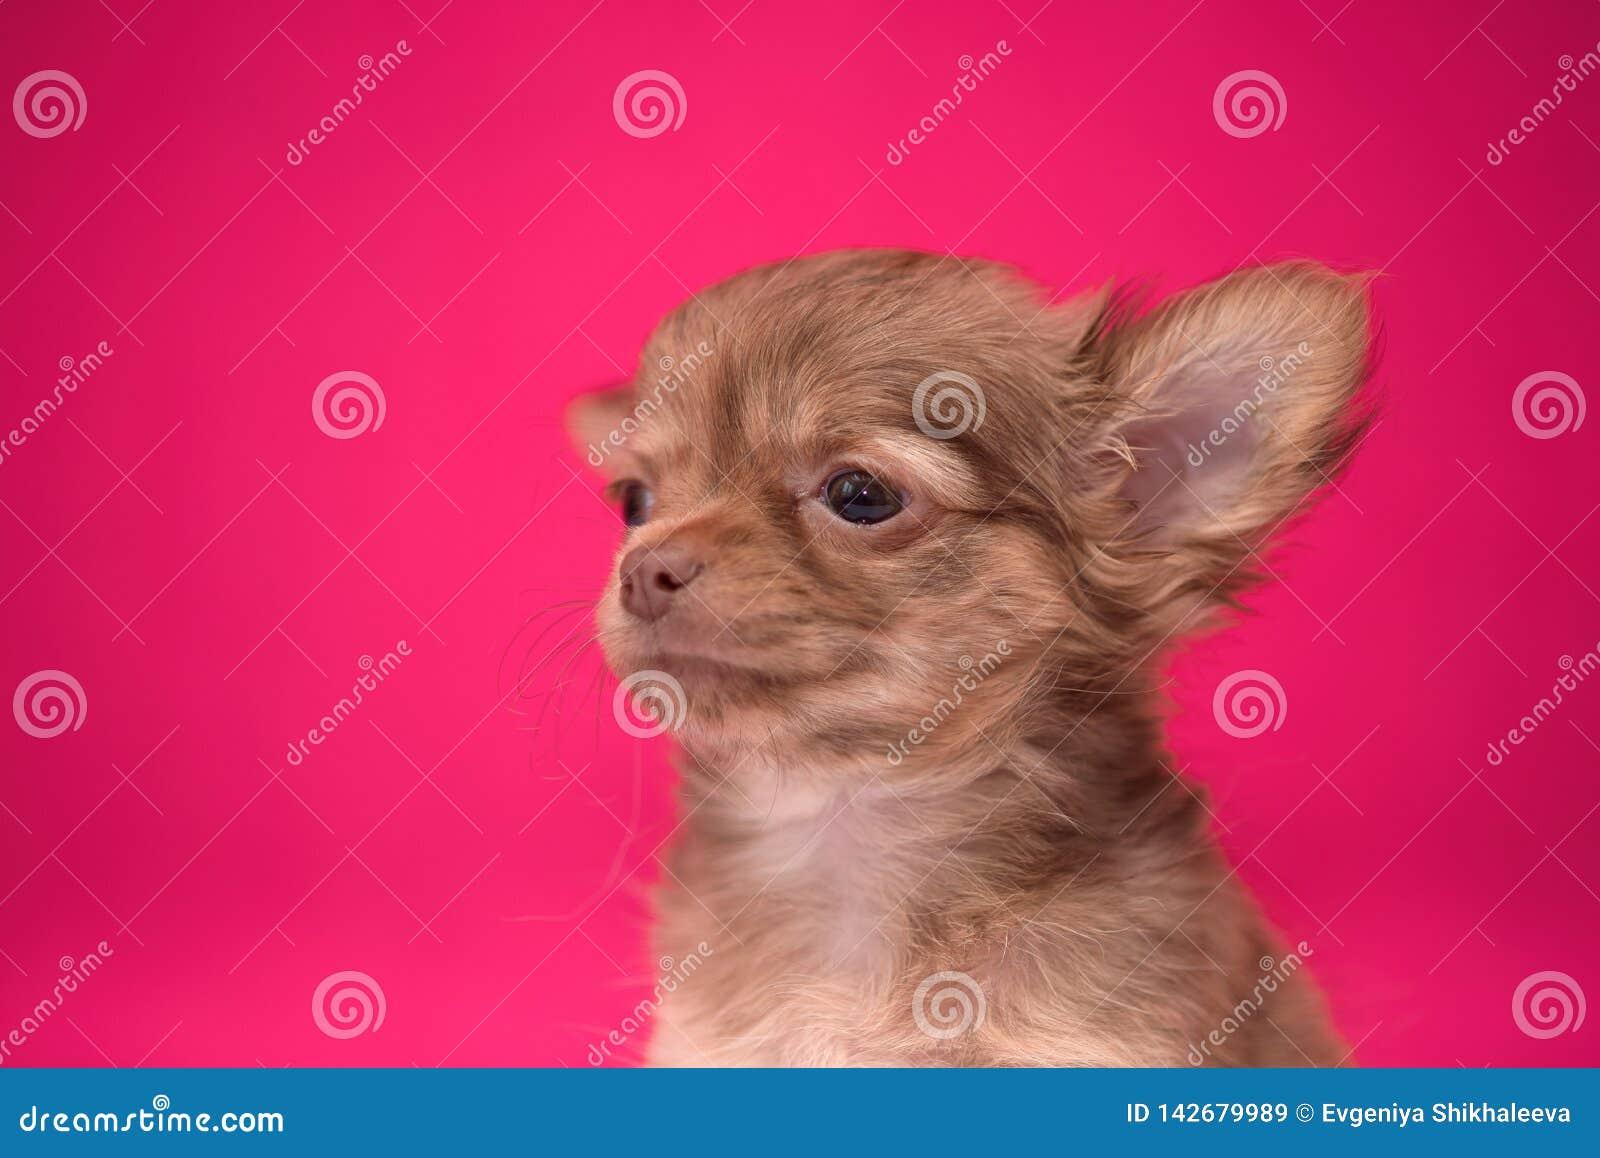 Het leuke roodharige Chihuahua-puppy zit op een karmozijnrode achtergrond